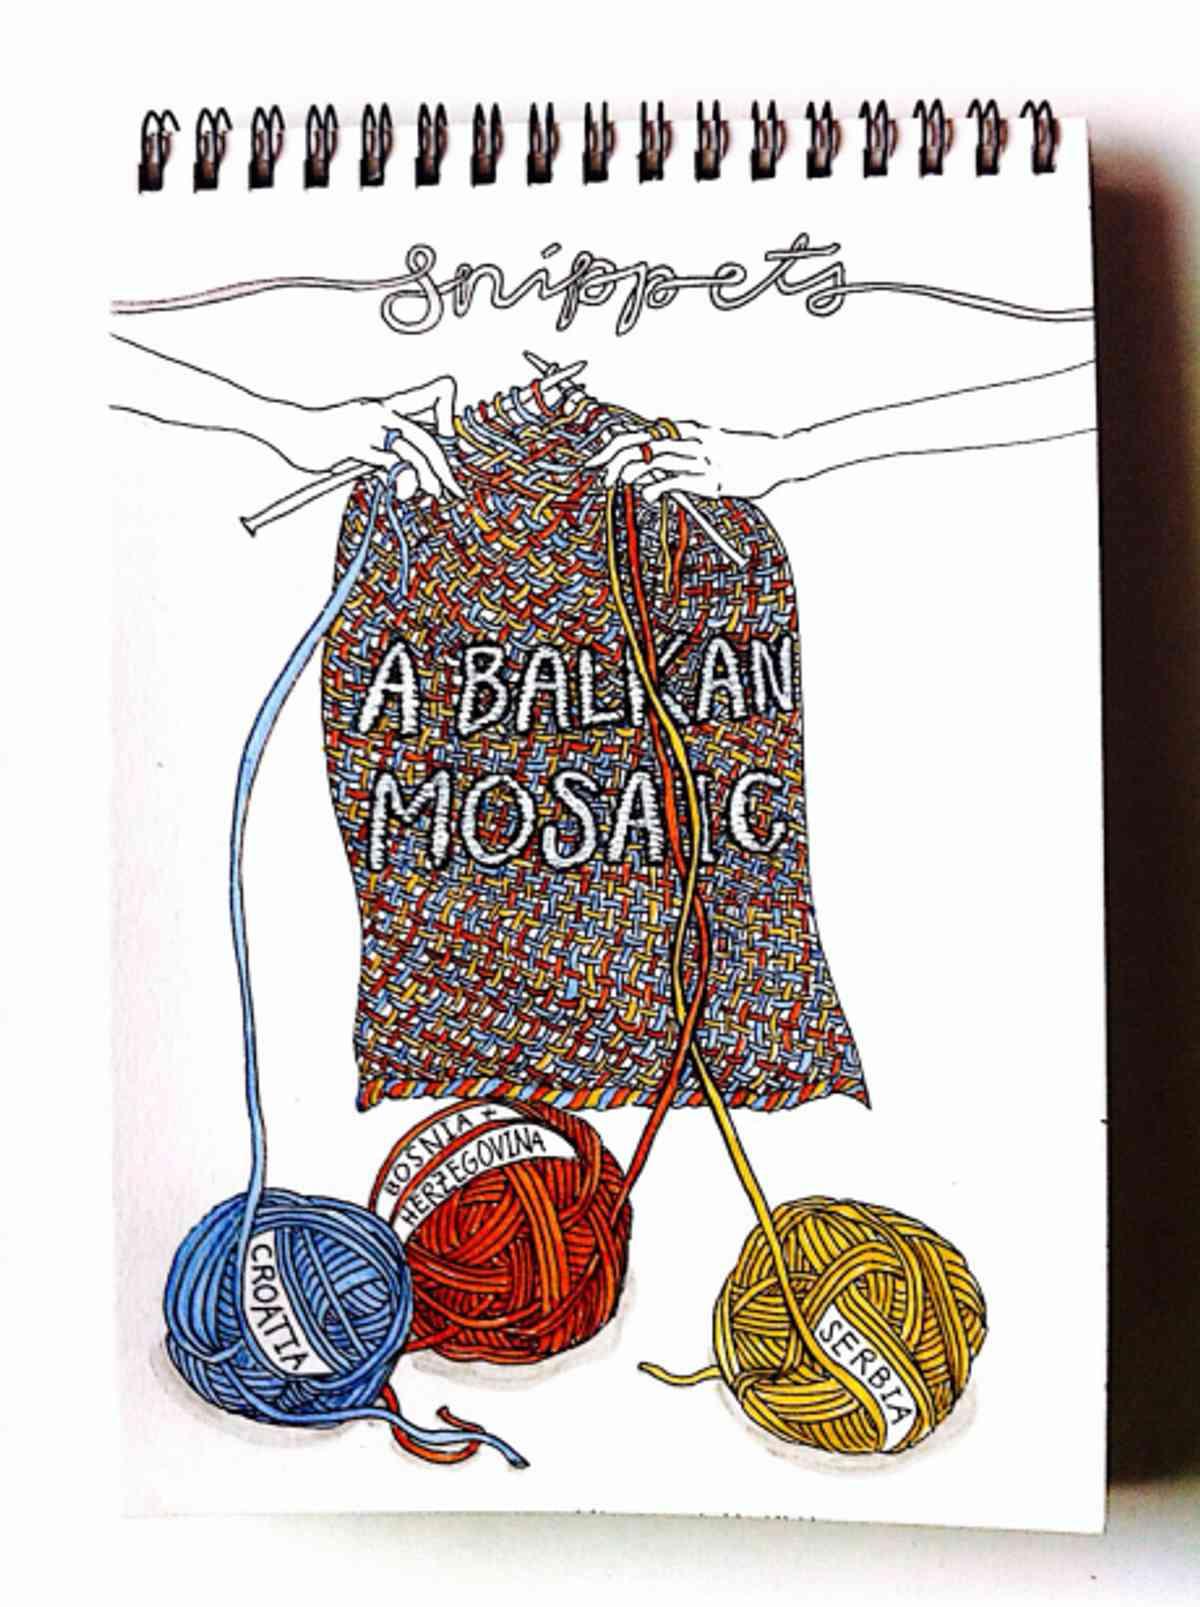 Balkan Mosaic (Emma Fick)